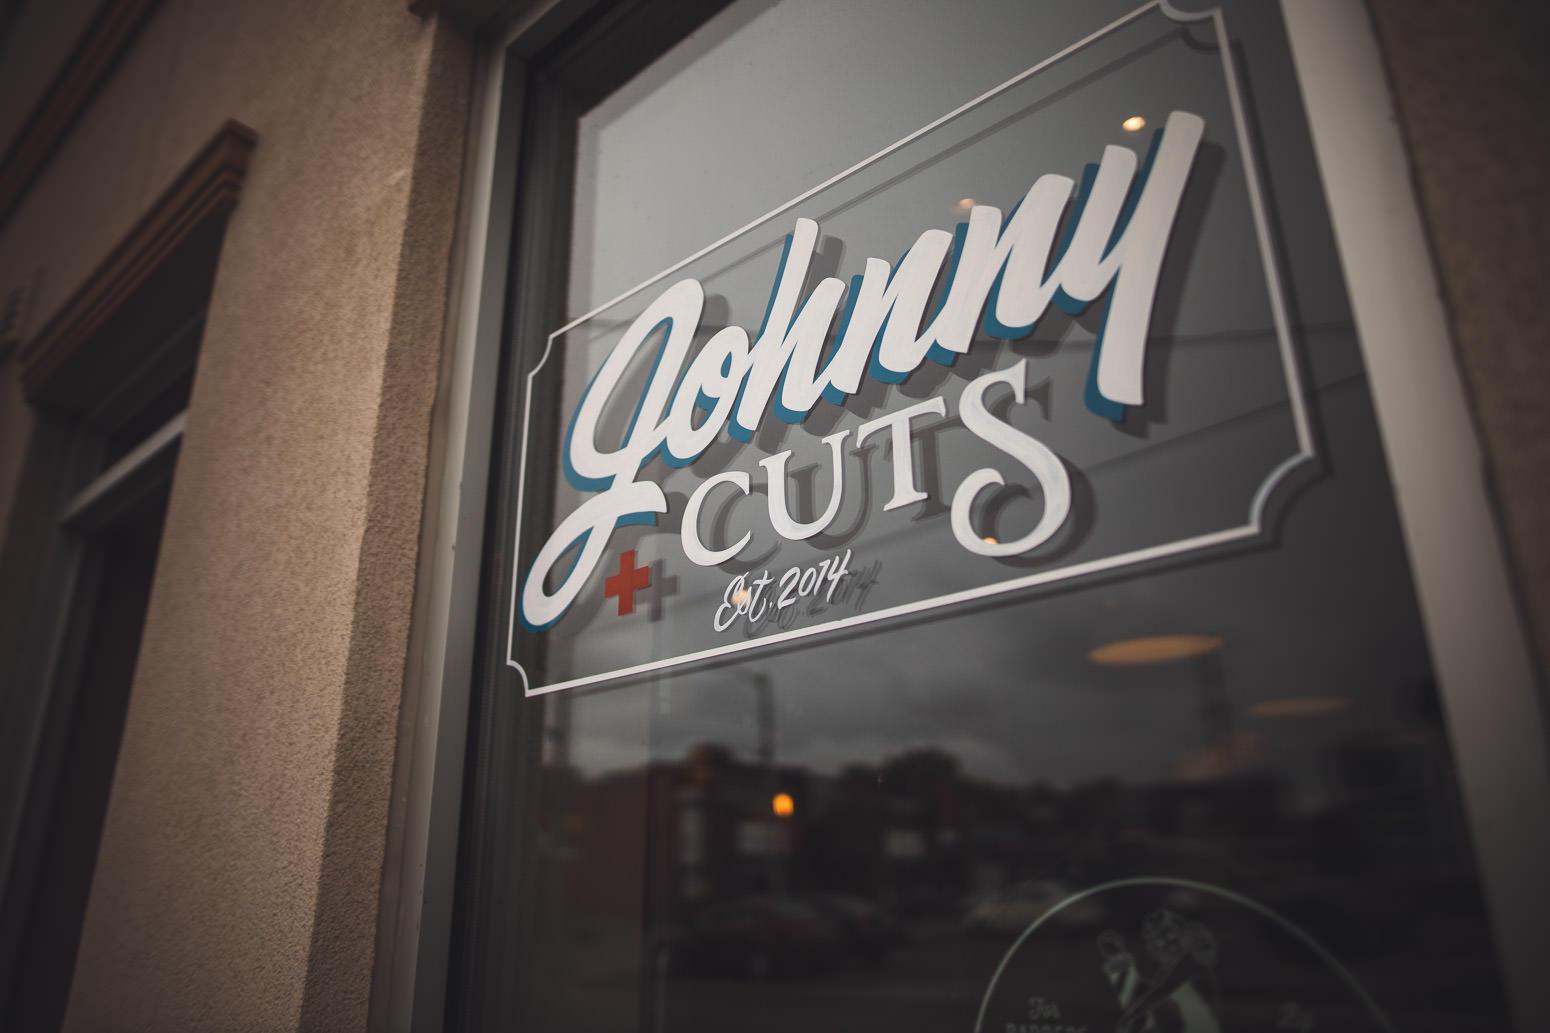 Johnny Cuts Barbershop front window Oshawa